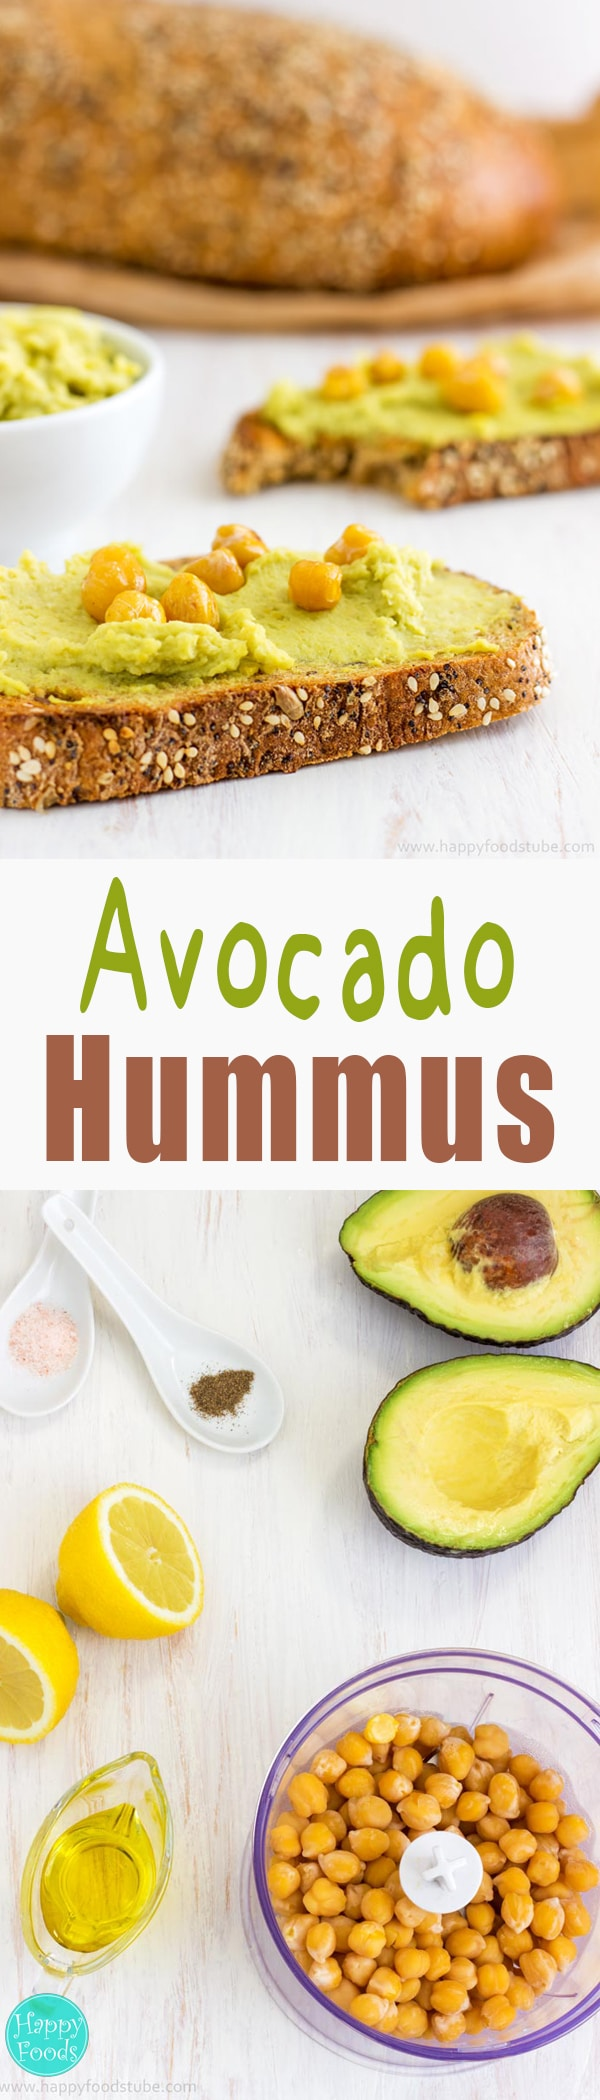 Super Healthy Creamy Avocado Hummus - Quick and easy recipe. Only 4-ingredients - avocado, chickpeas (garbanzo beans), lemon, extra virgin olive oil. Vegan / Vegetarian   happyfoodstube.com